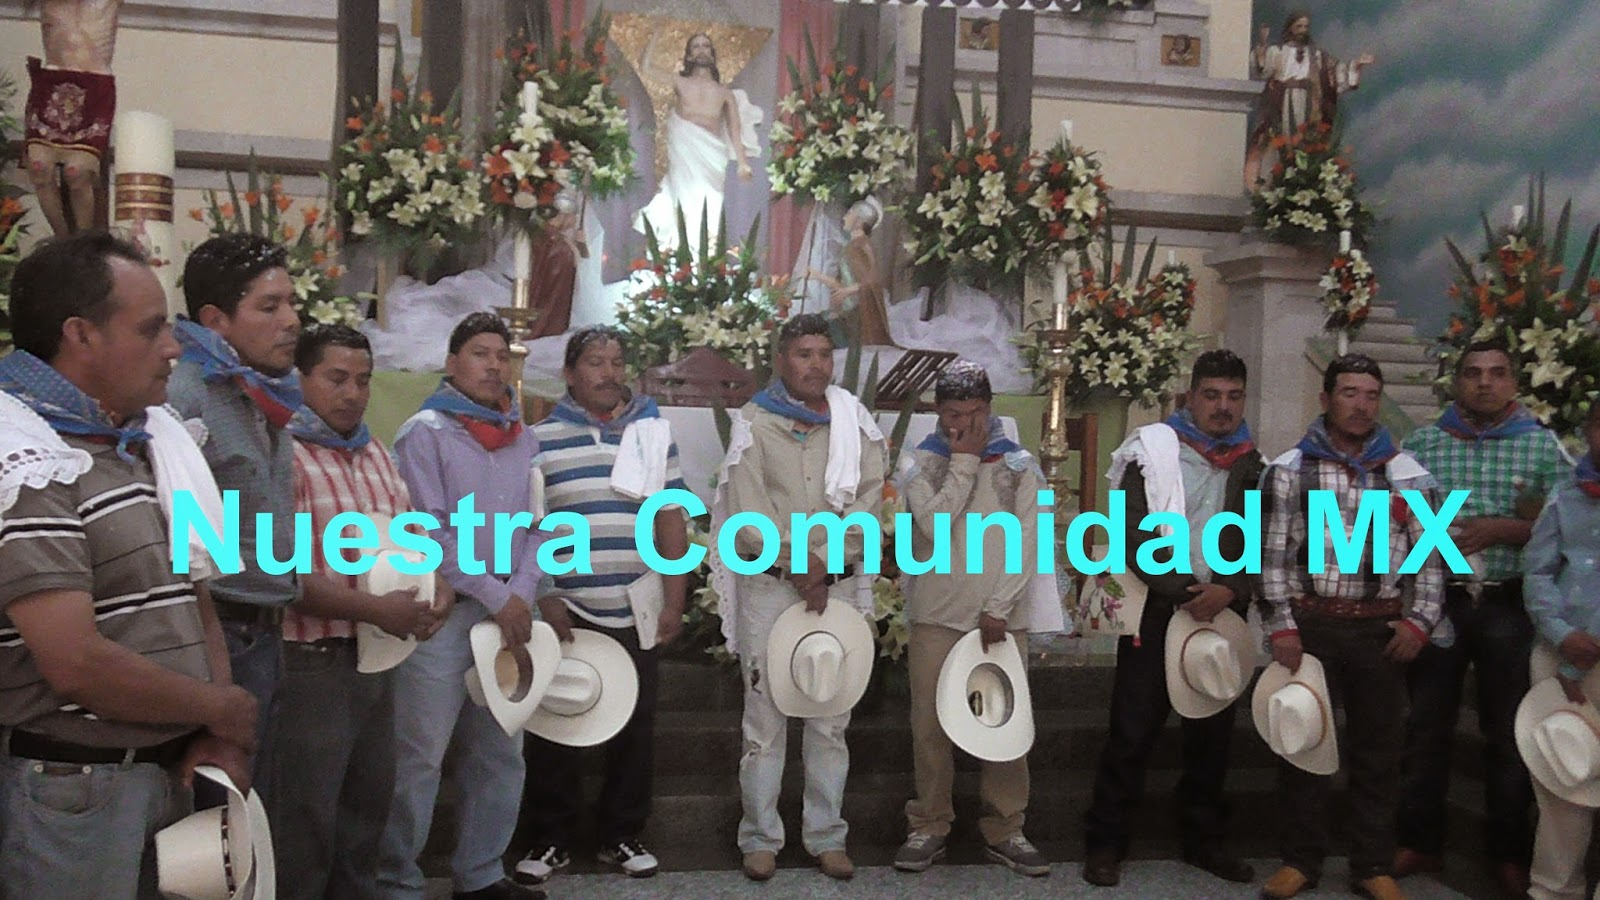 nuestracomunidadmx.blogspot.com/